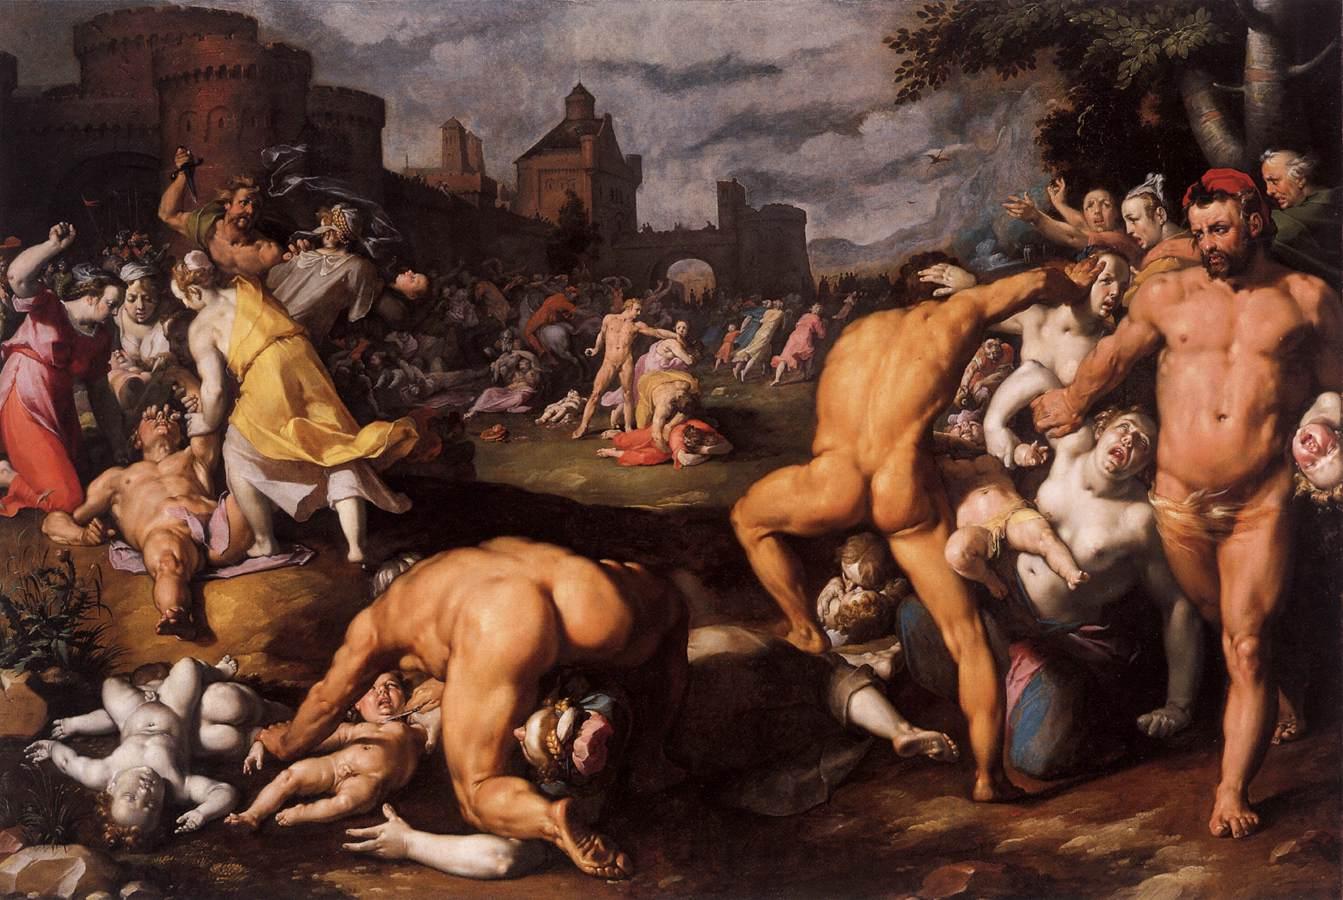 Cornelis_Cornelisz._van_Haarlem_-_Massac